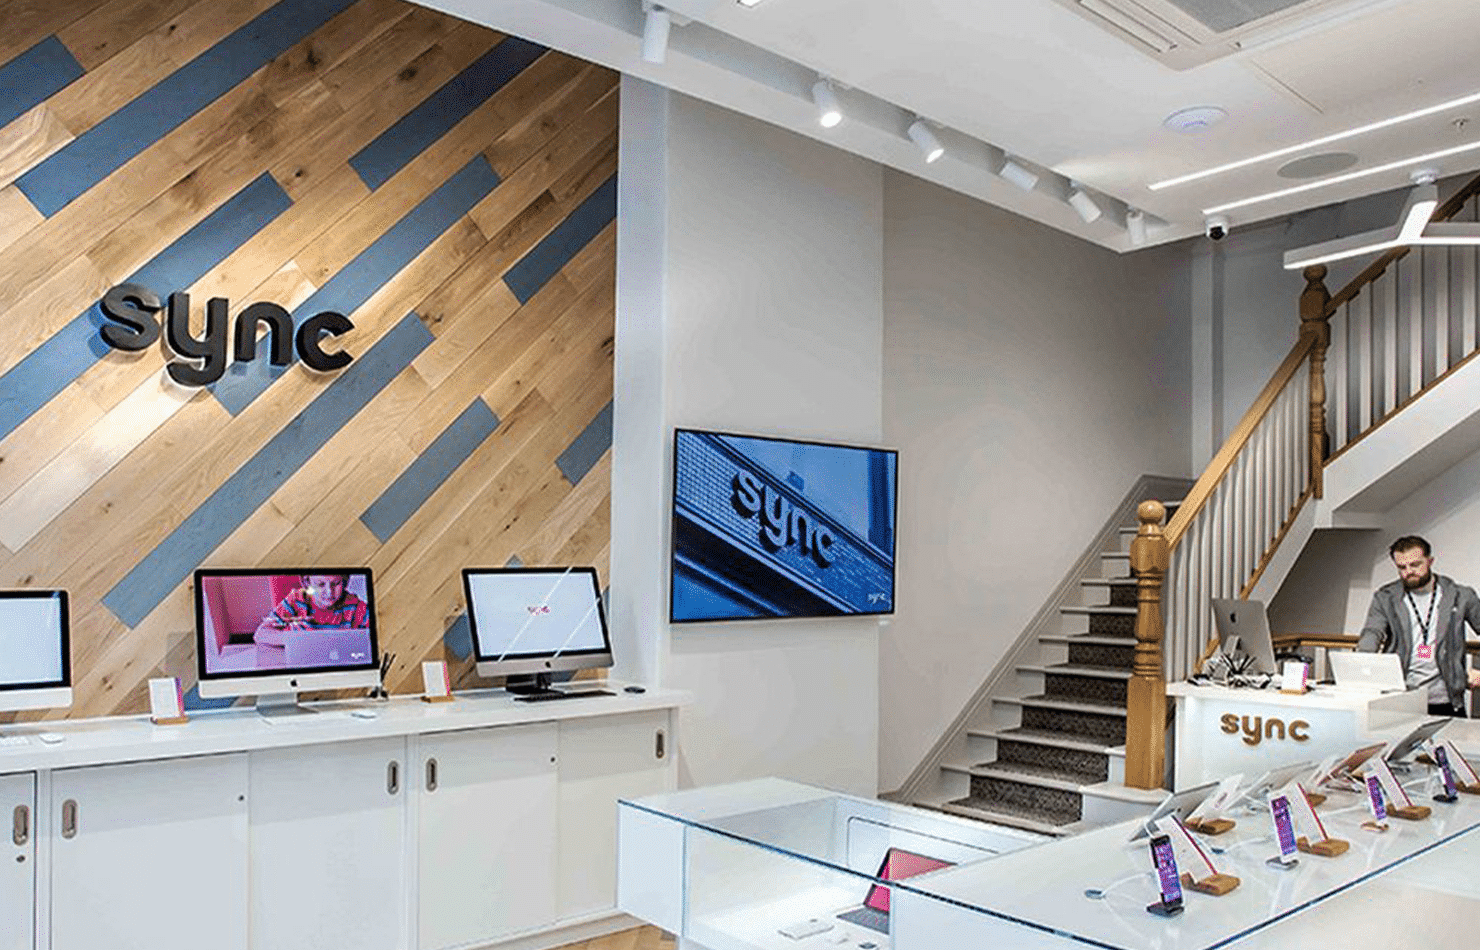 Sync Store Apple